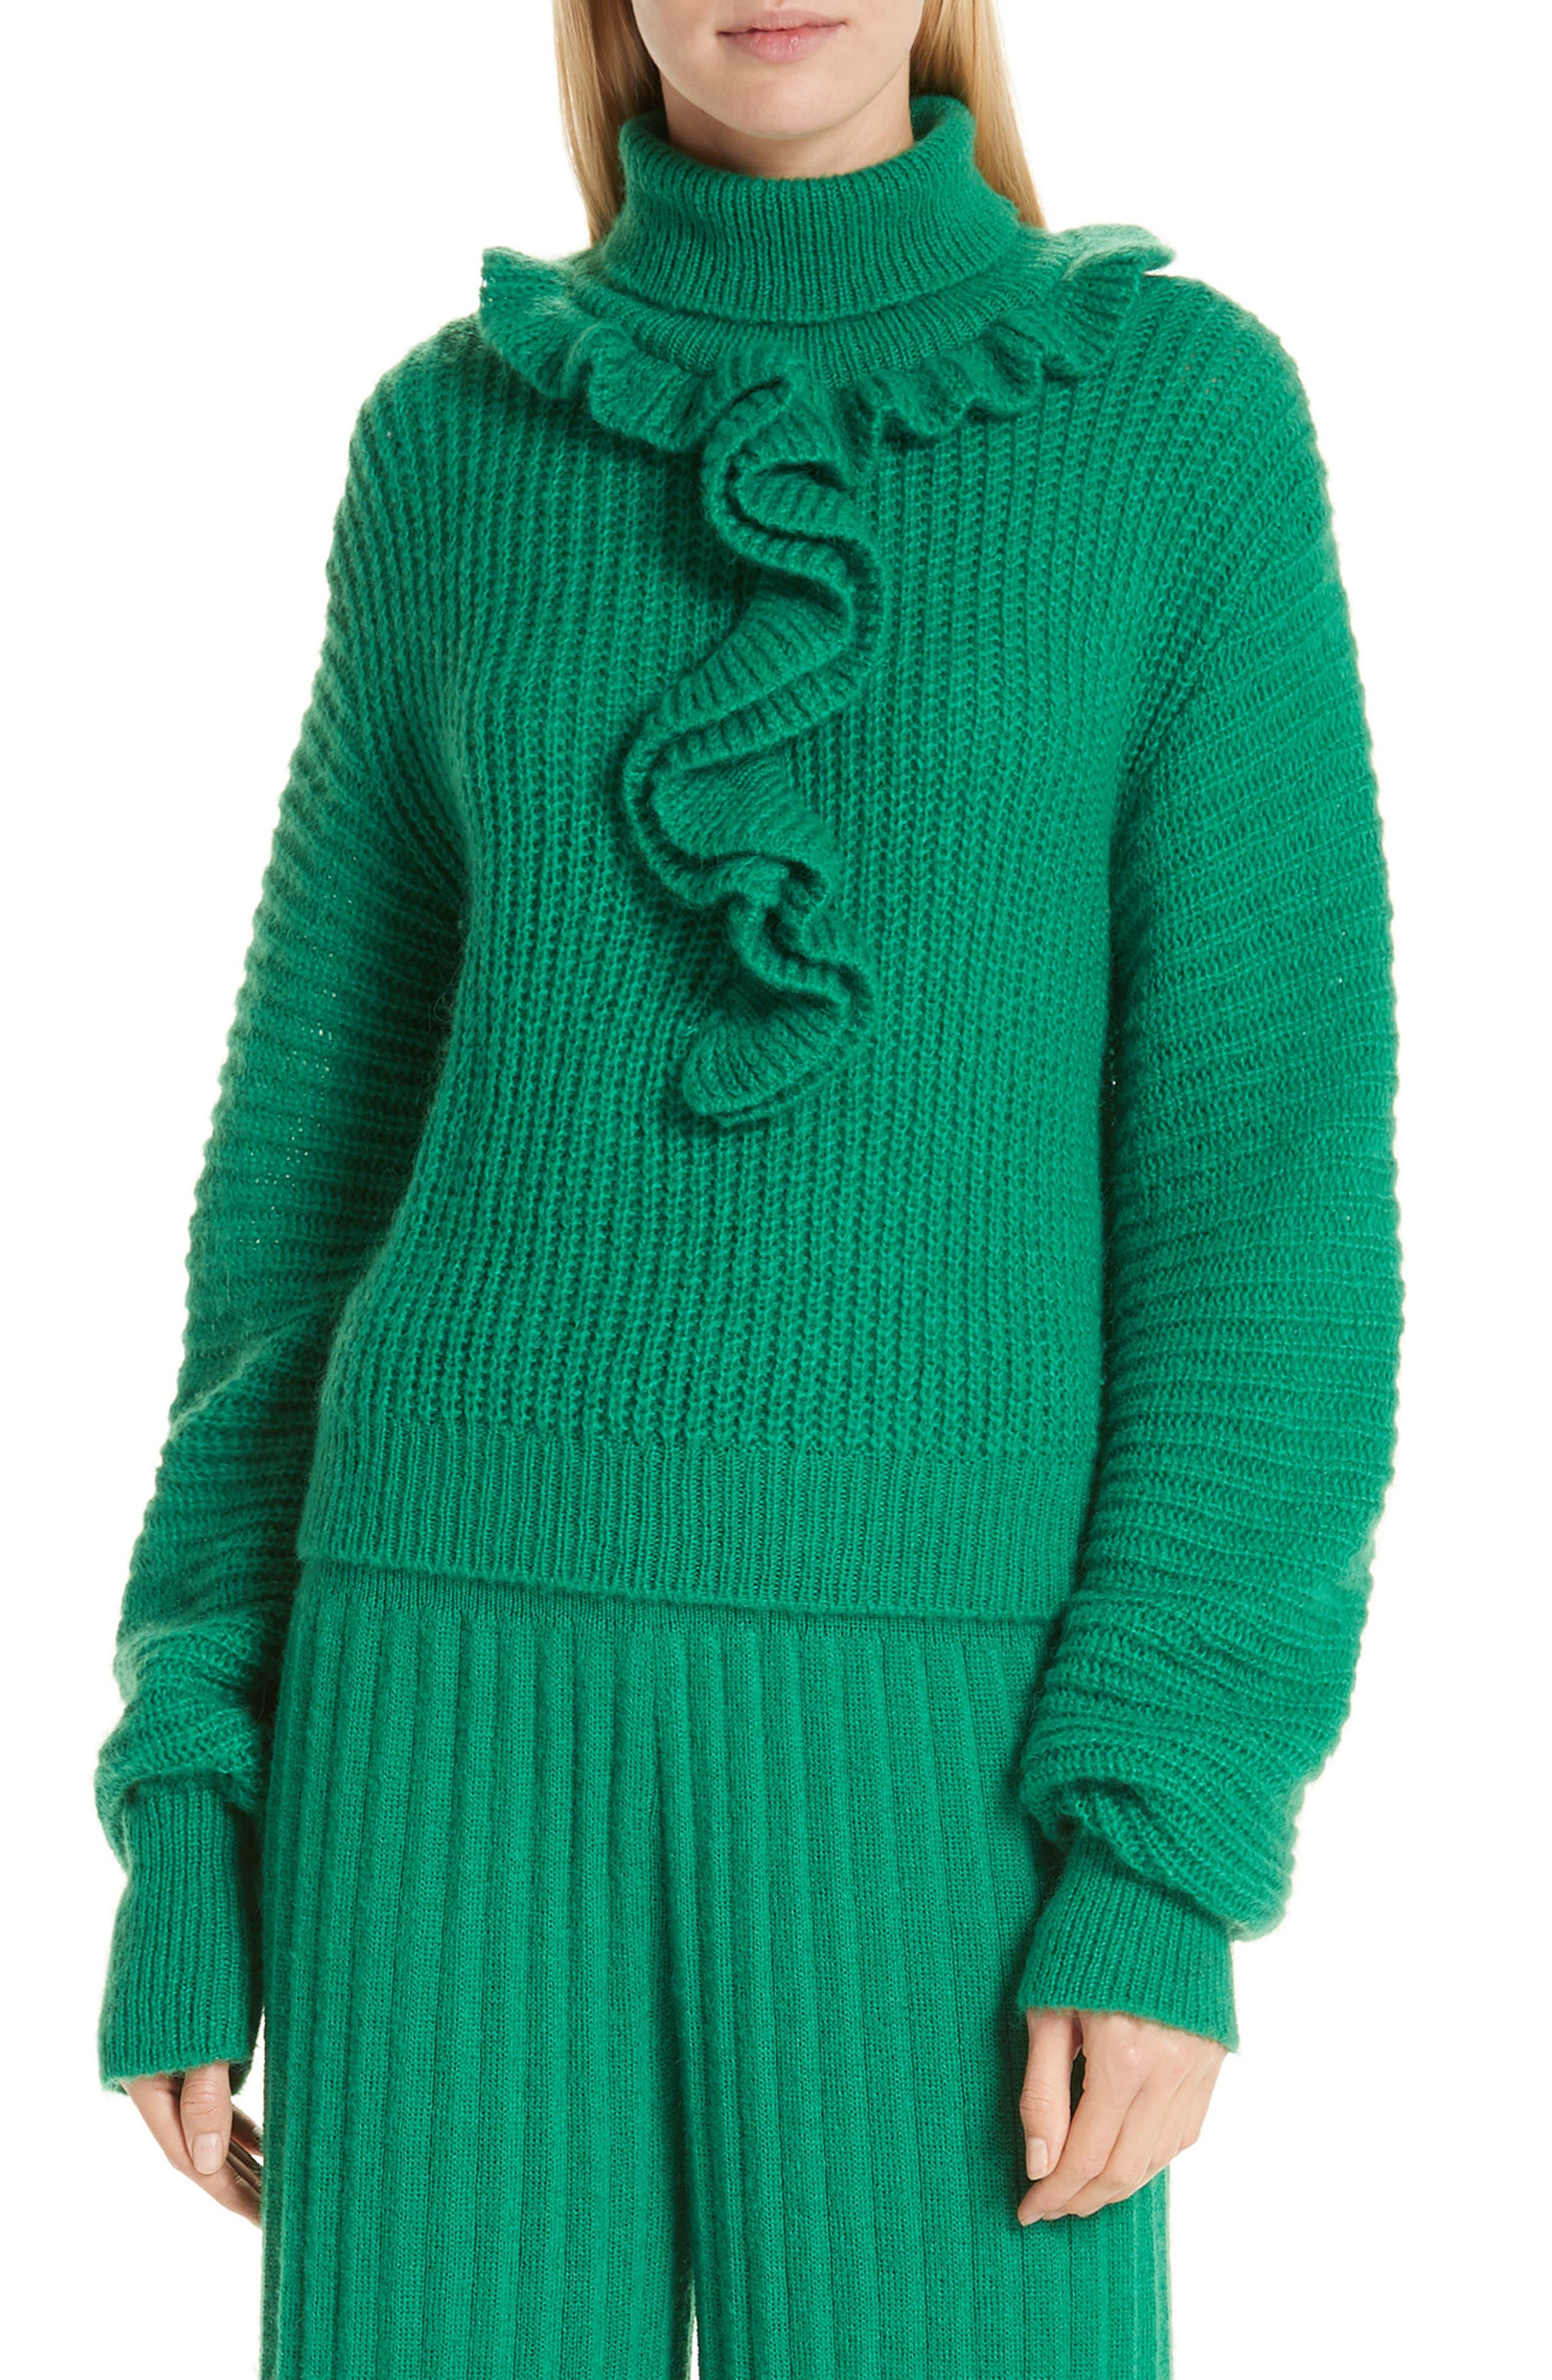 Ruffle Neck Sweater,                             Main thumbnail 1, color,                             GRASS GREEN